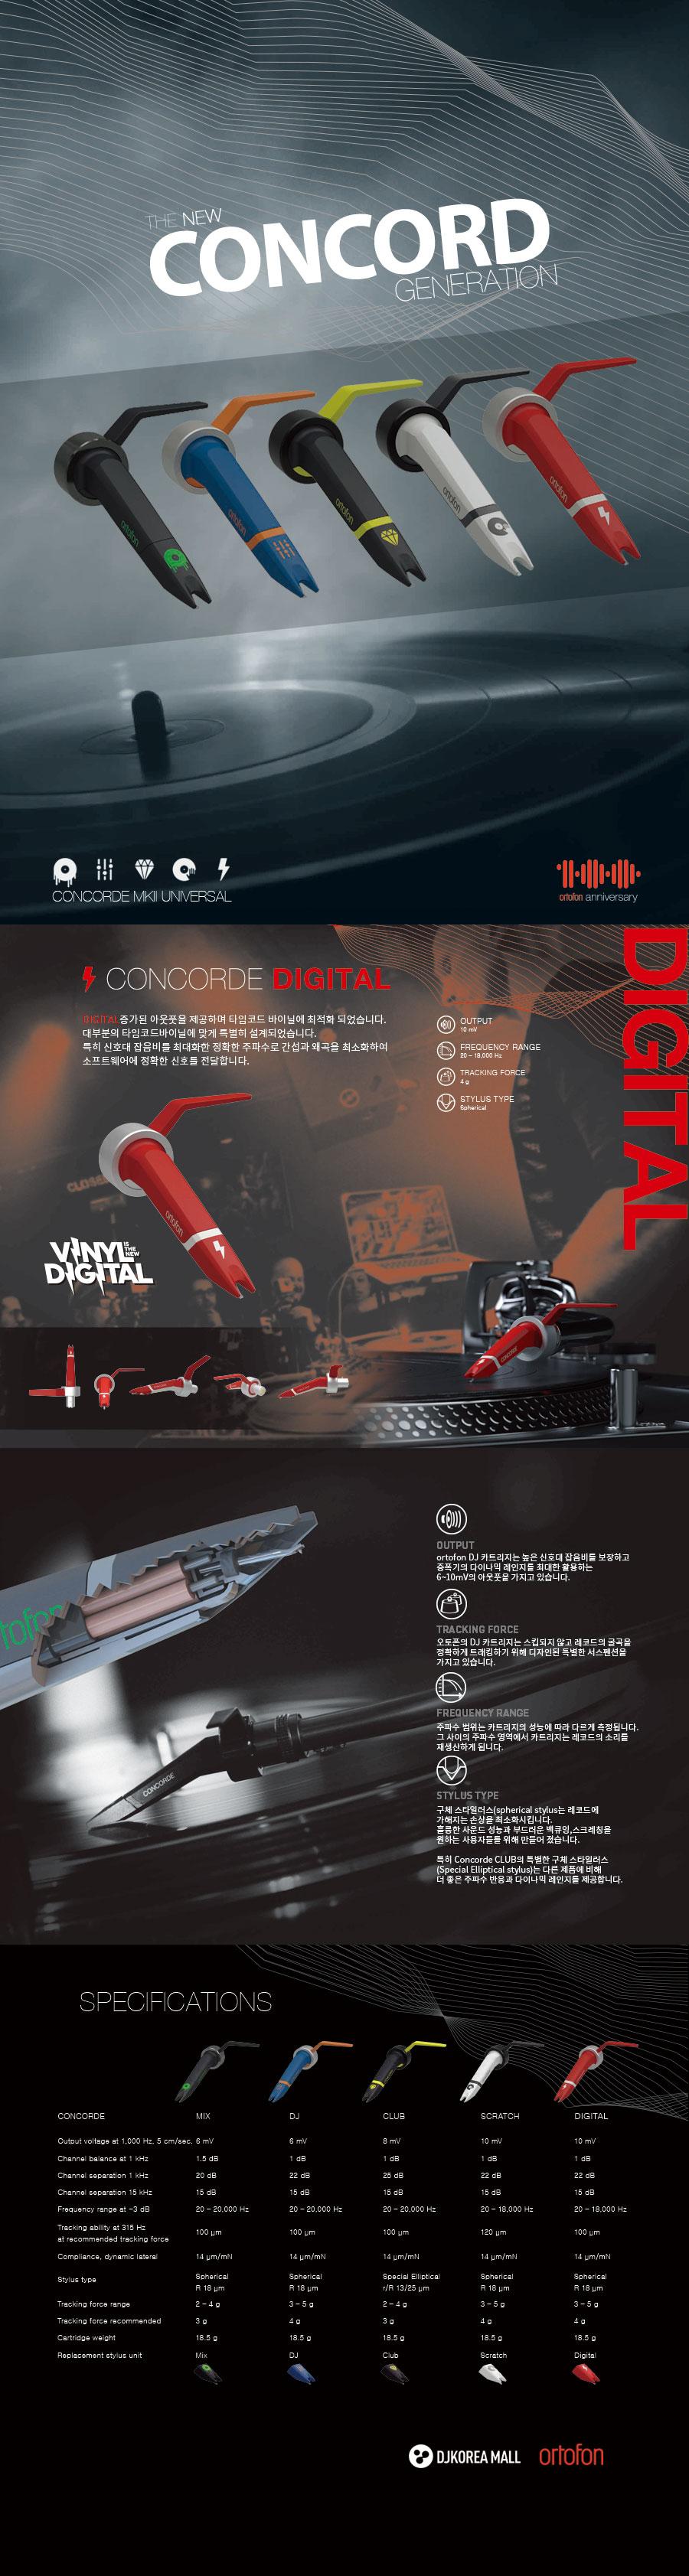 ortofon_CC_mk2_digital_150740